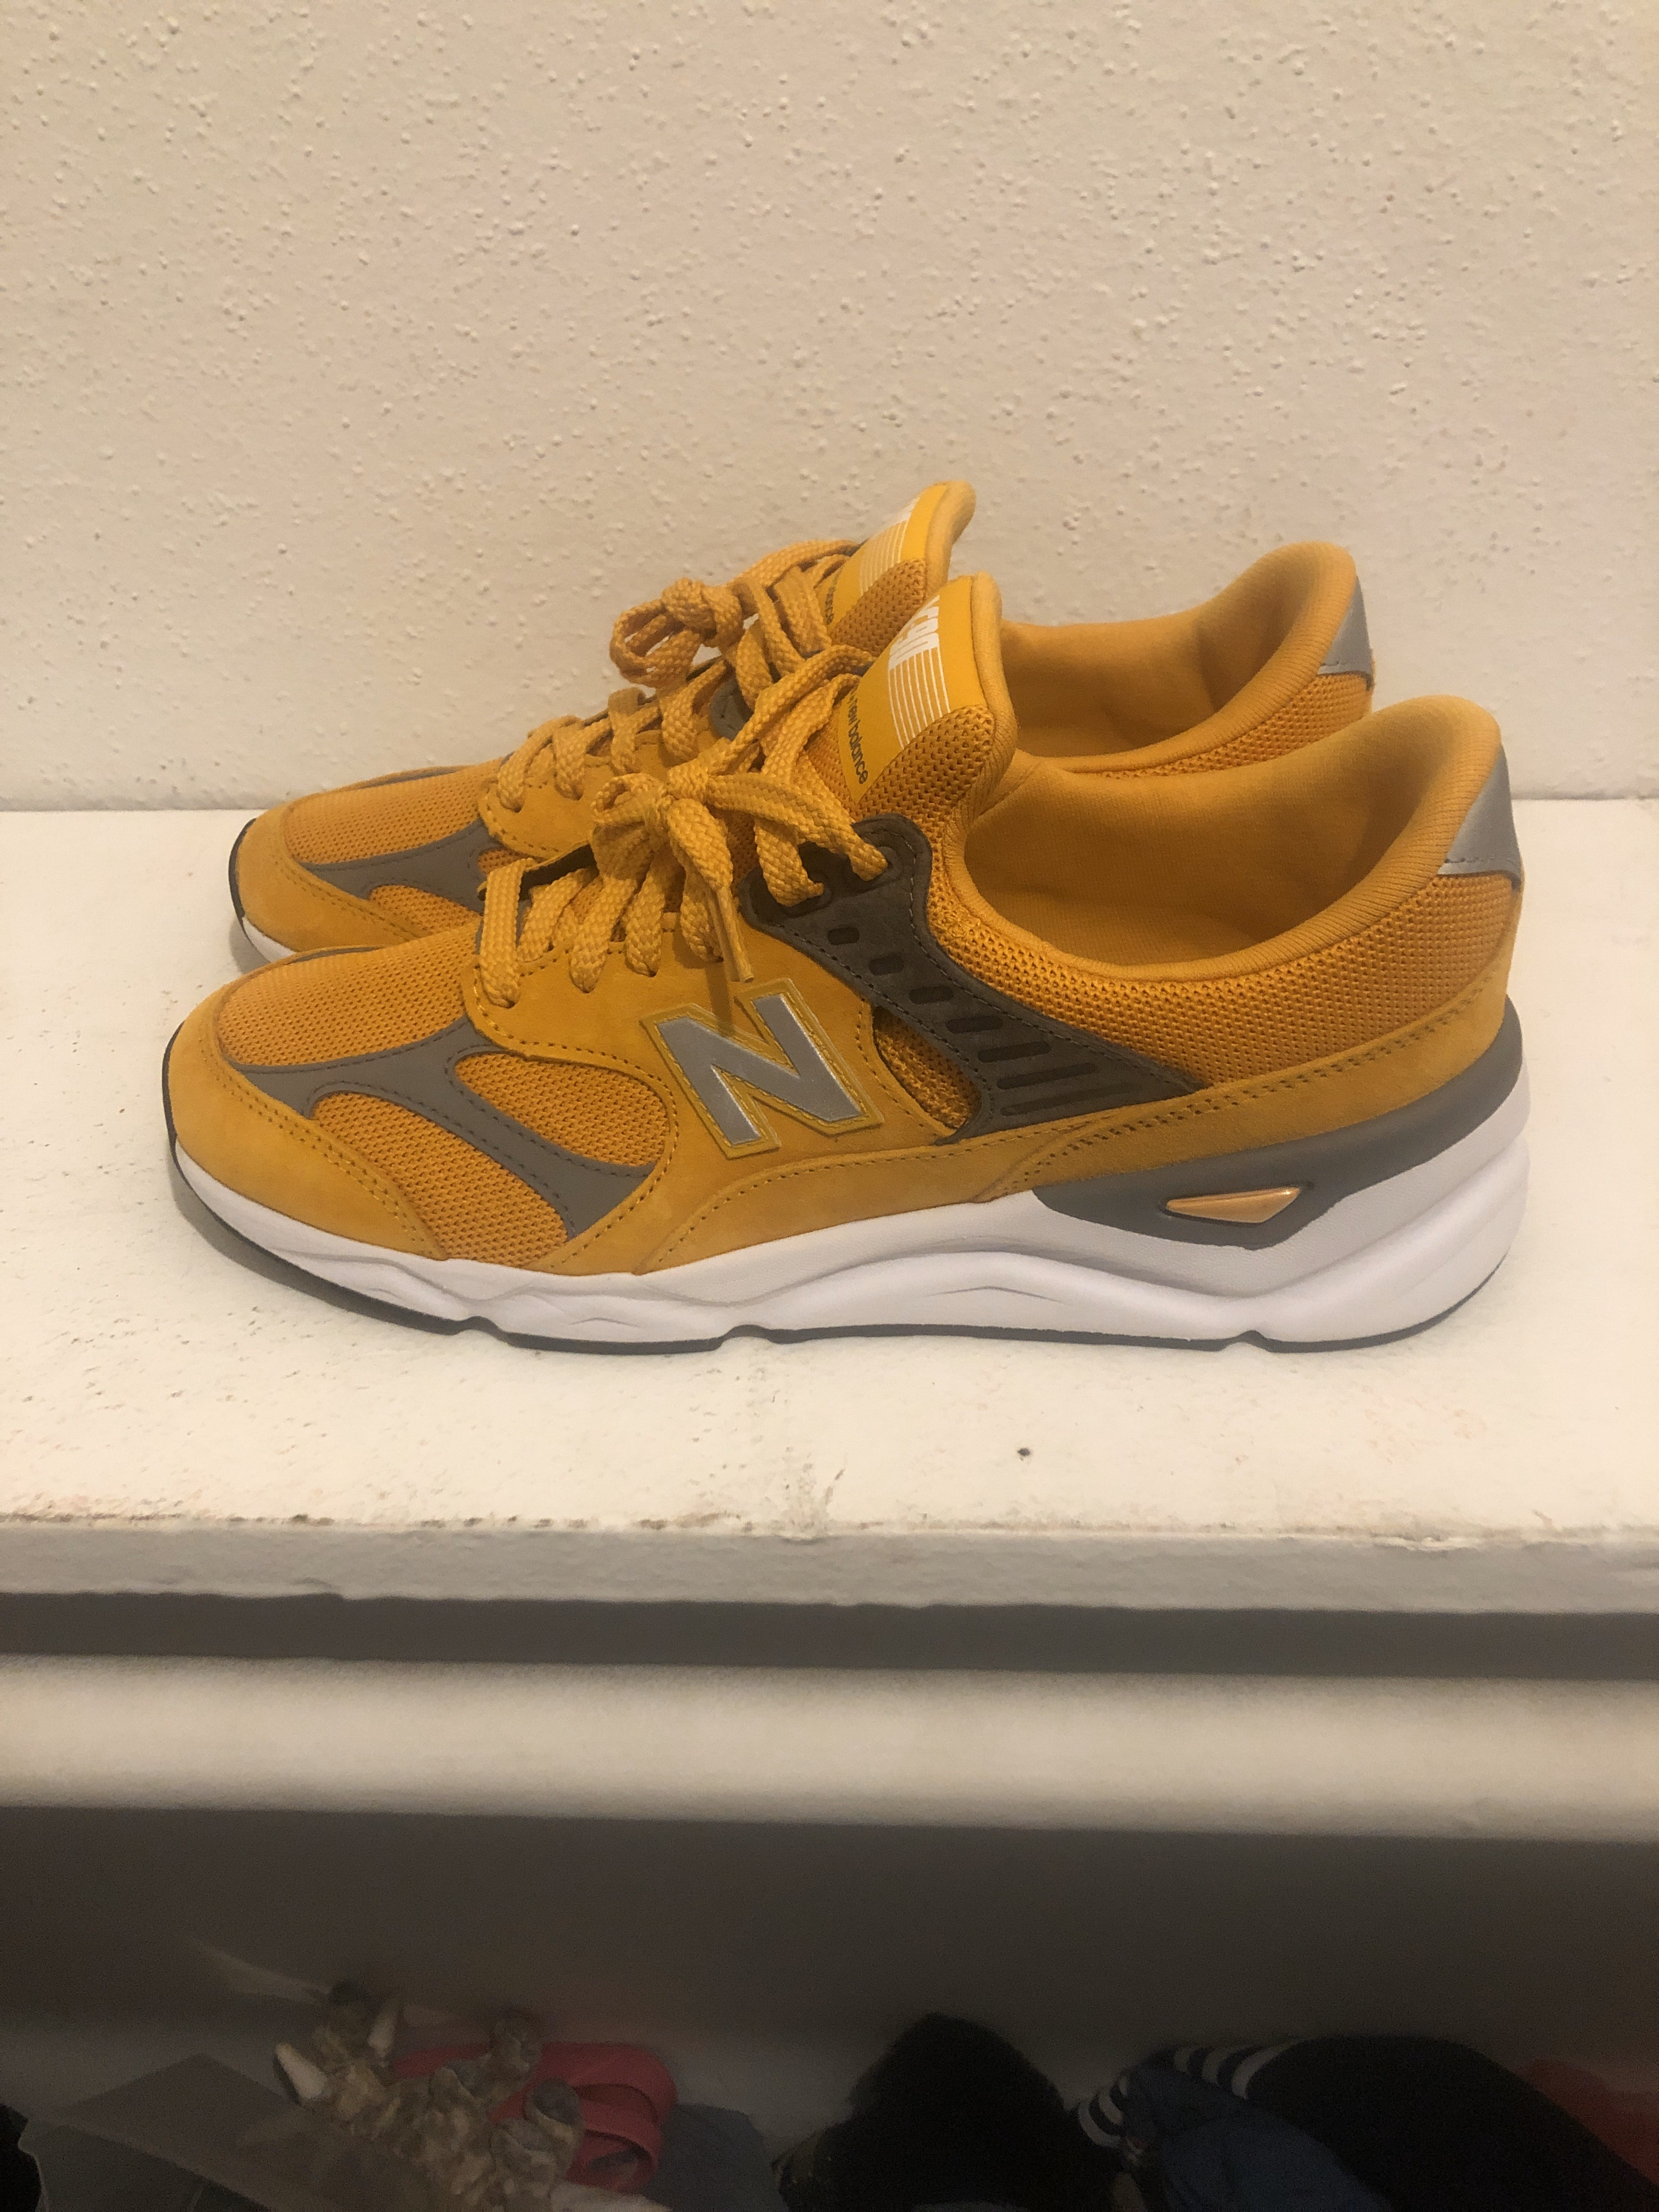 New Balance - $110 - Size 10.5